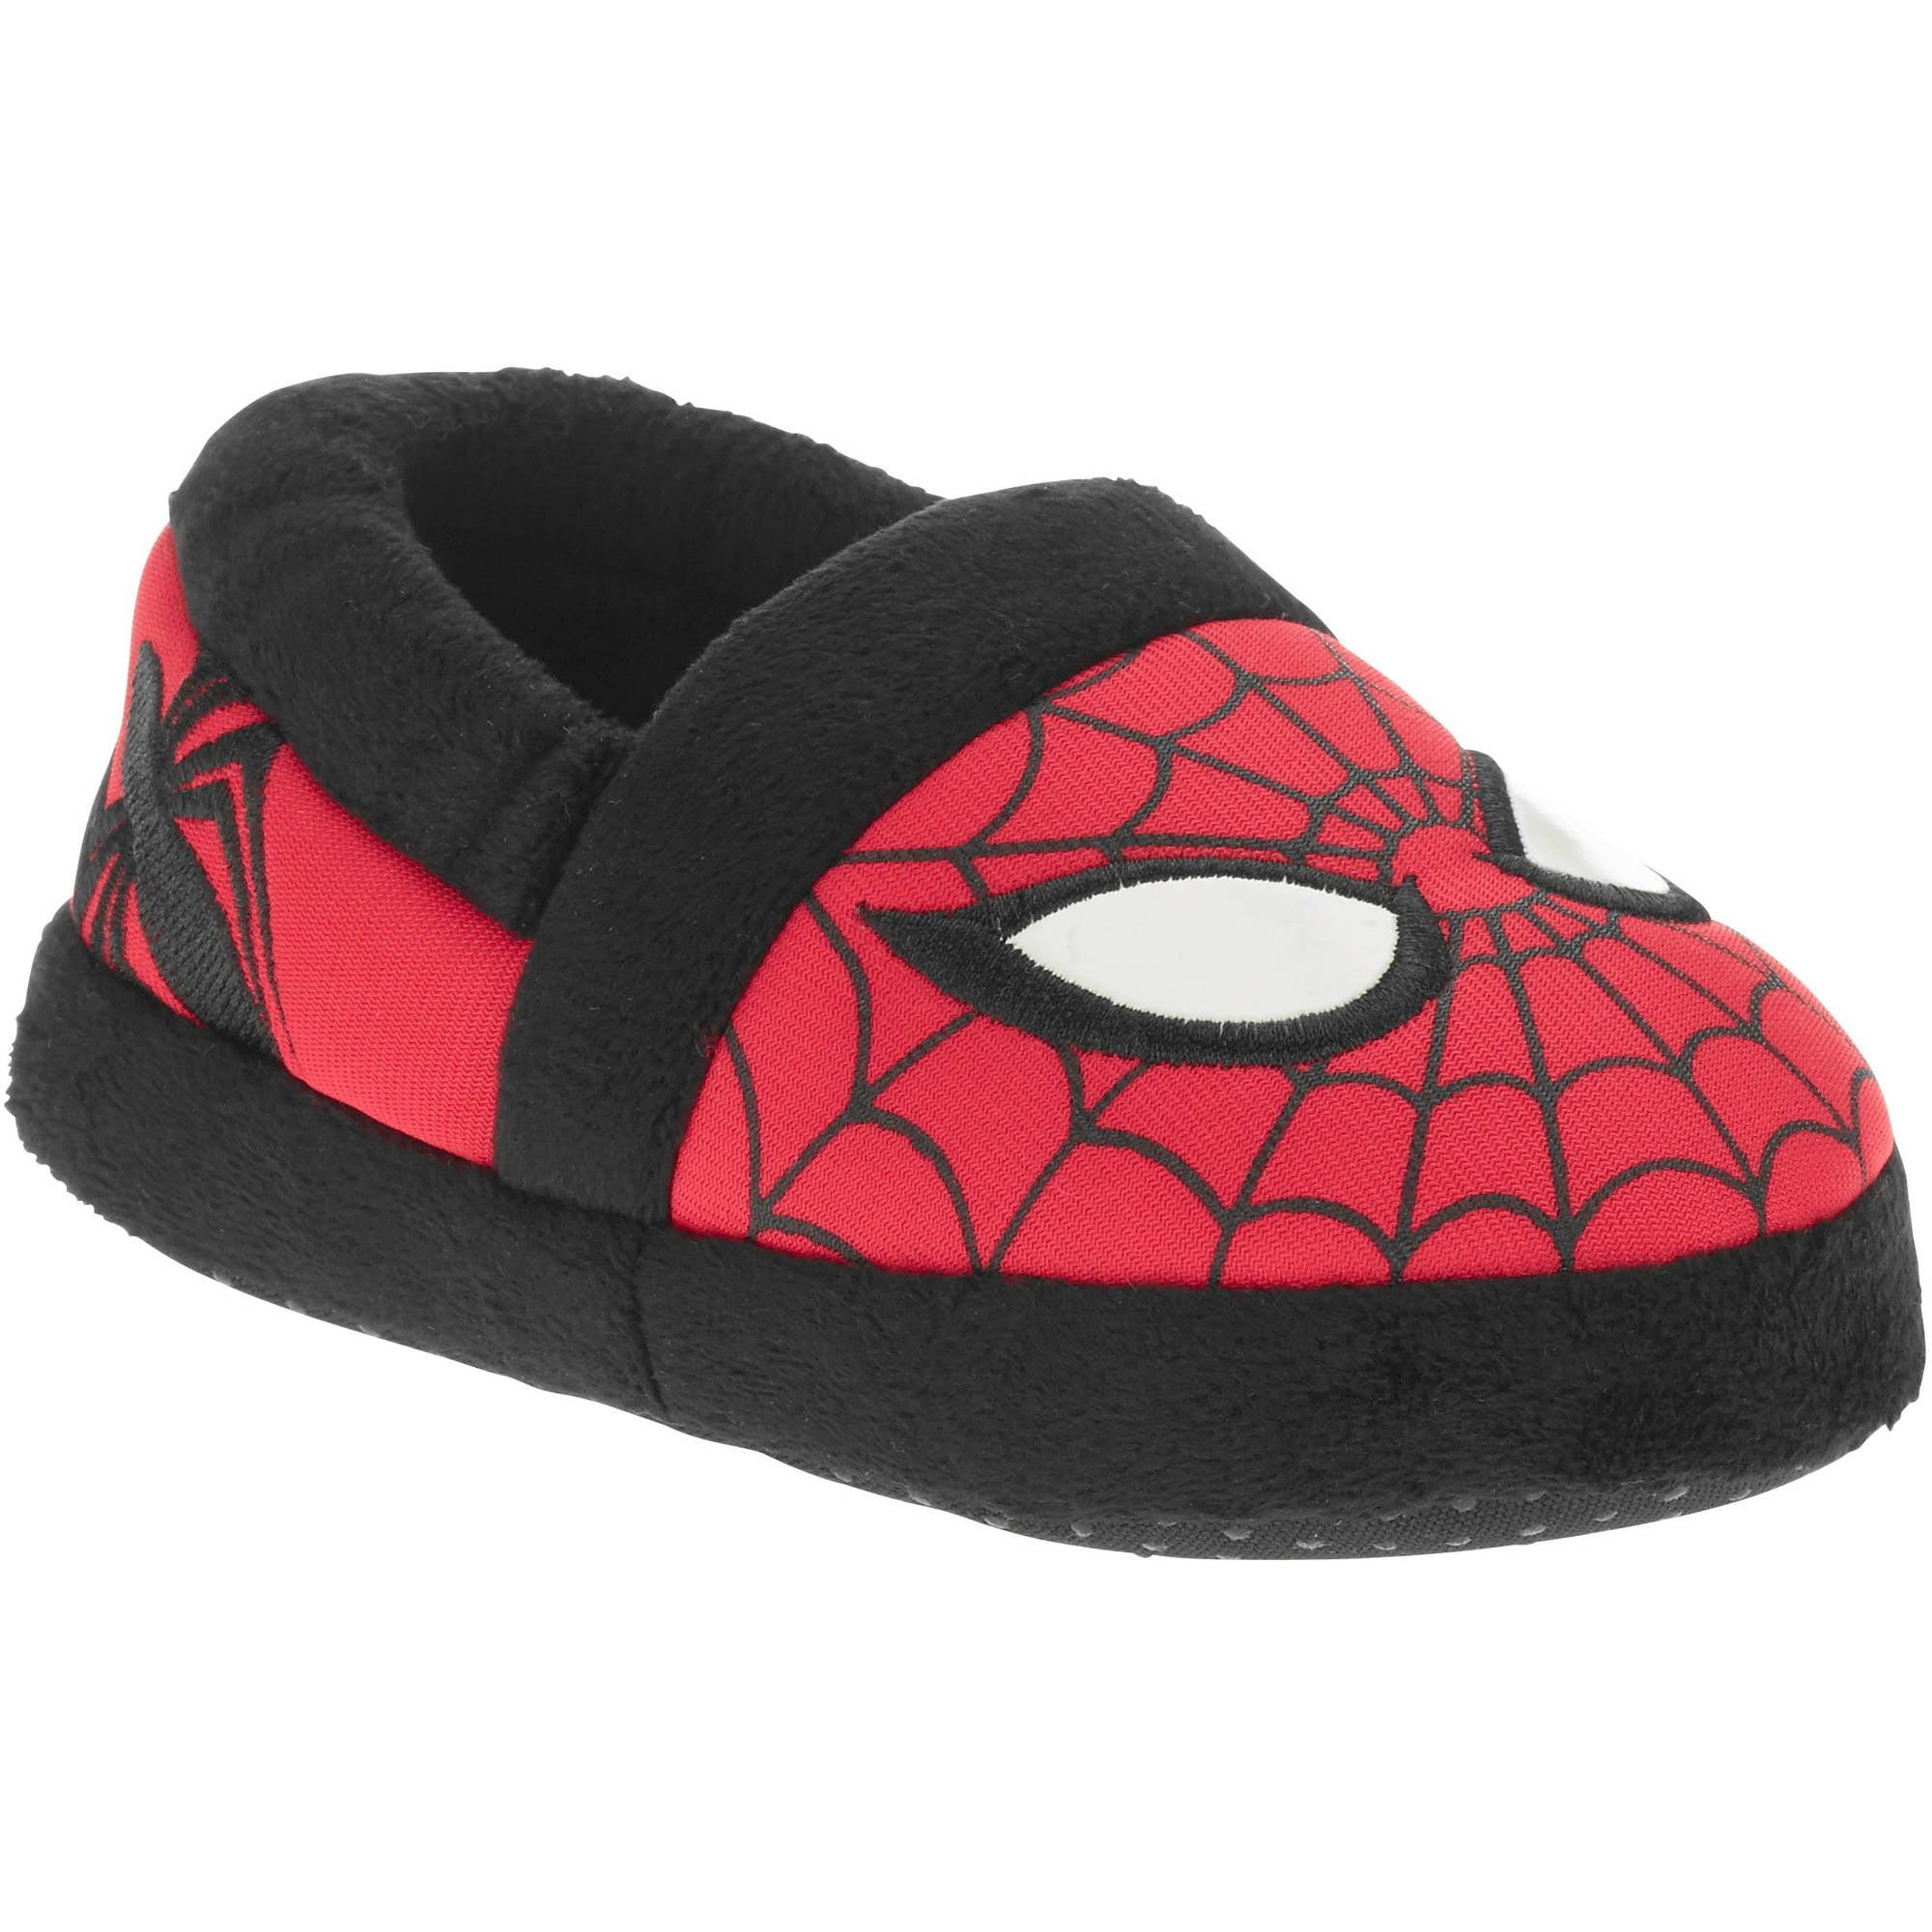 Marvel Licensed Tdlr Slipper Spiderman - Walmart.com